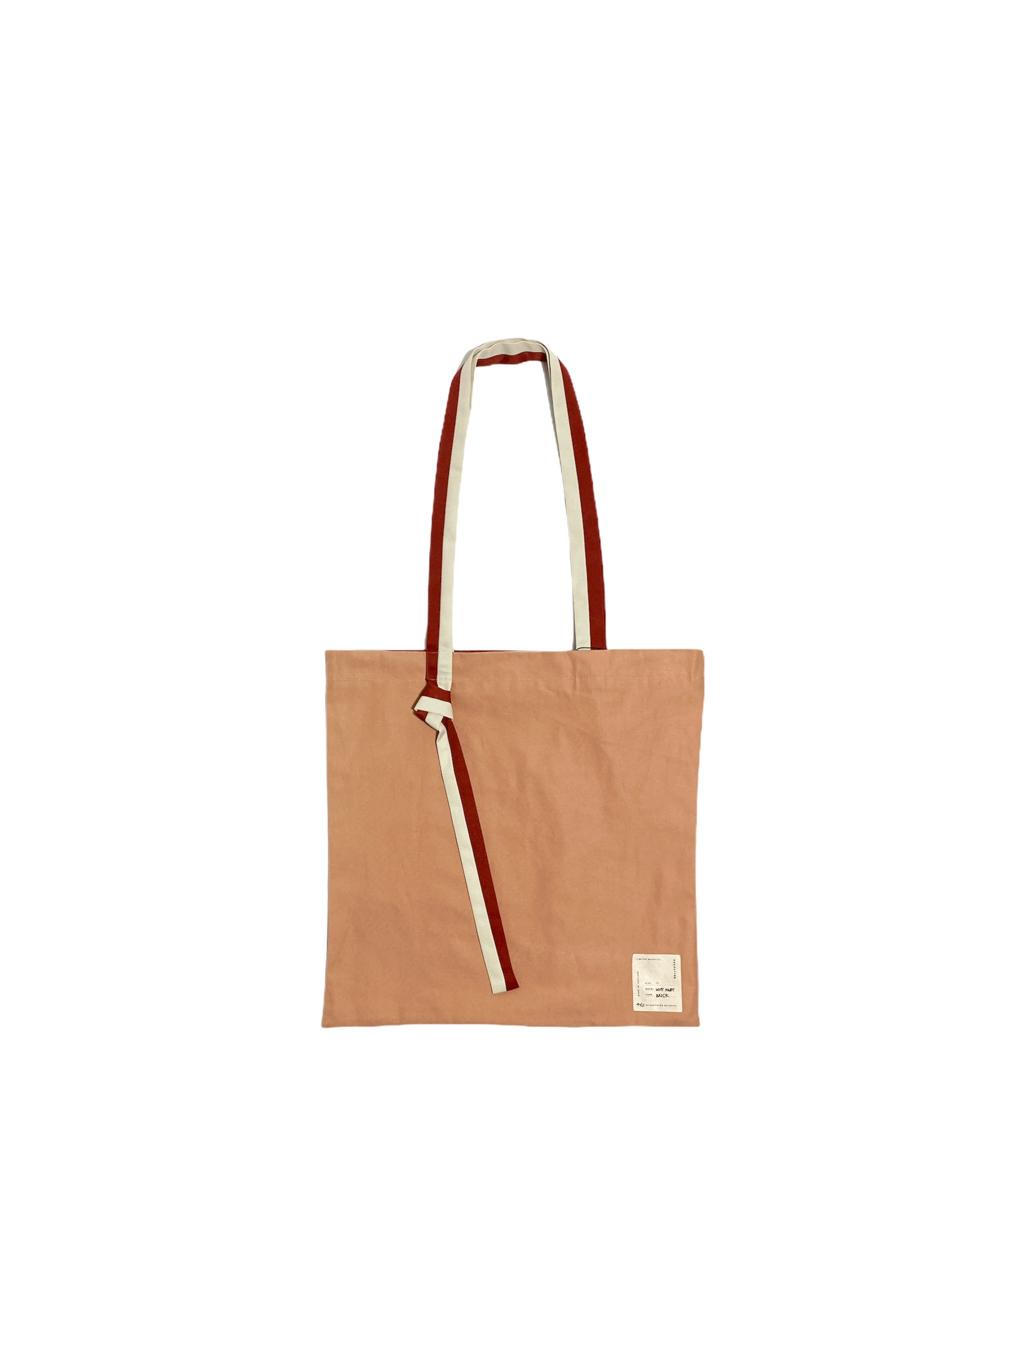 Why Knot Tote Bag (Brick)